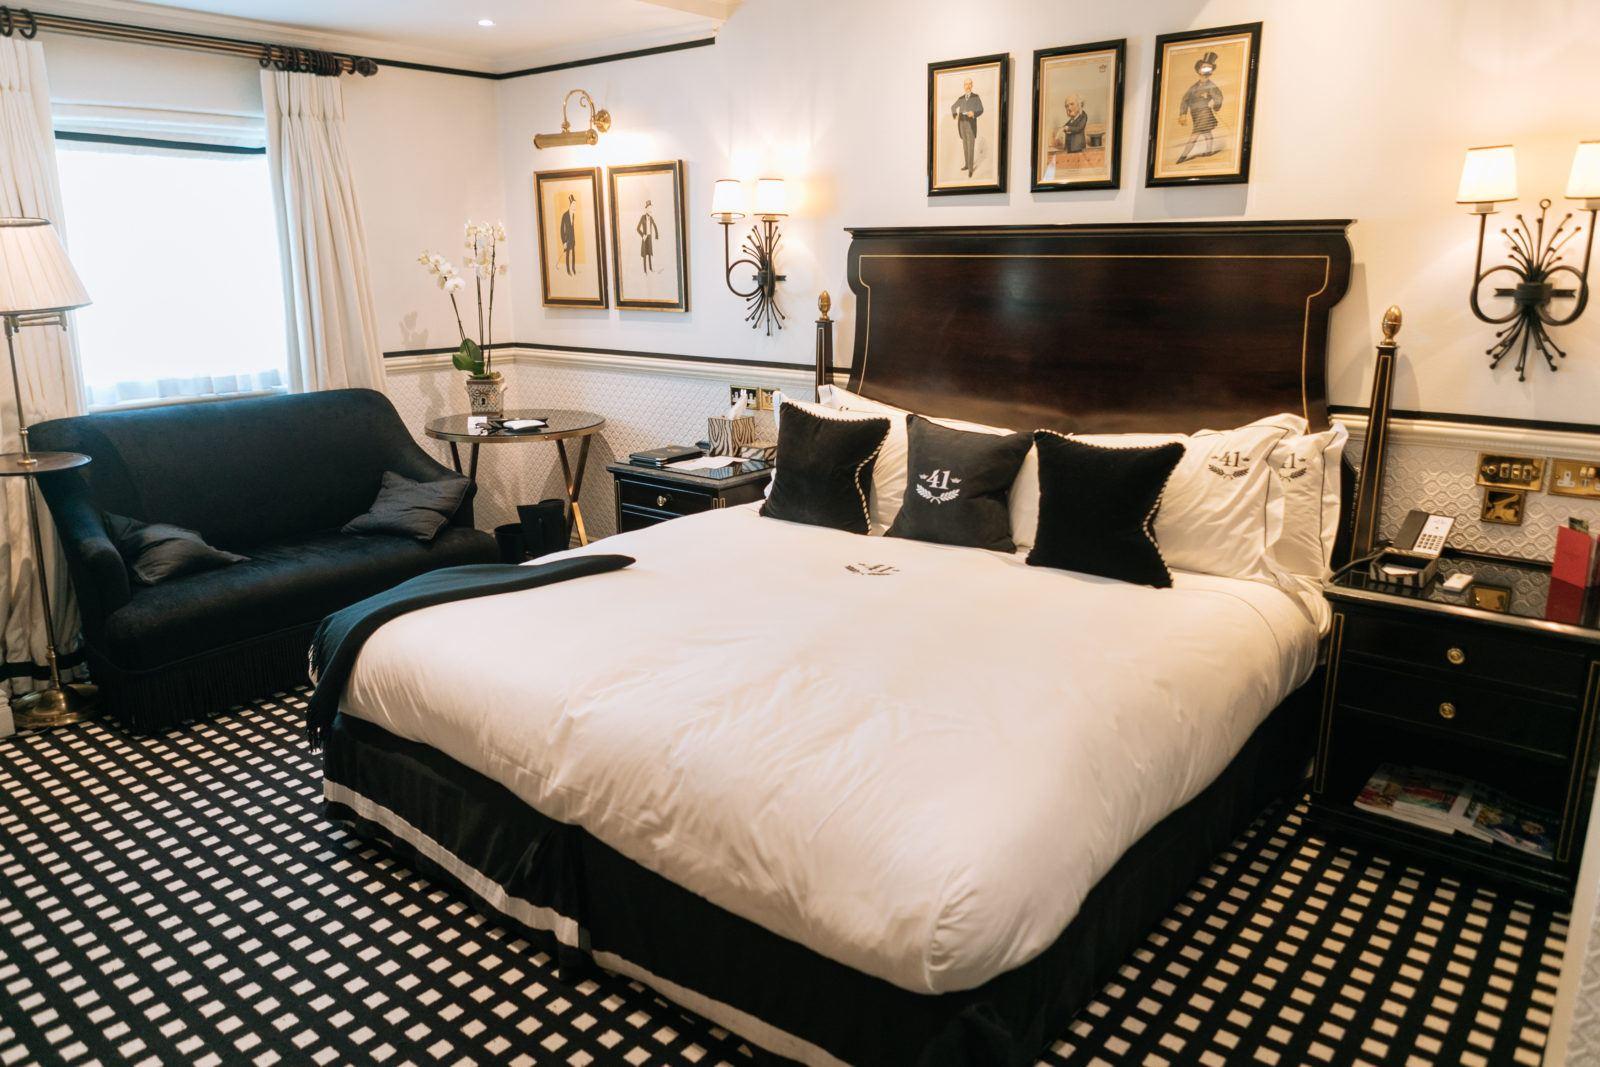 Expedia VIP Access Hotel 41 Kach and Jonathan8